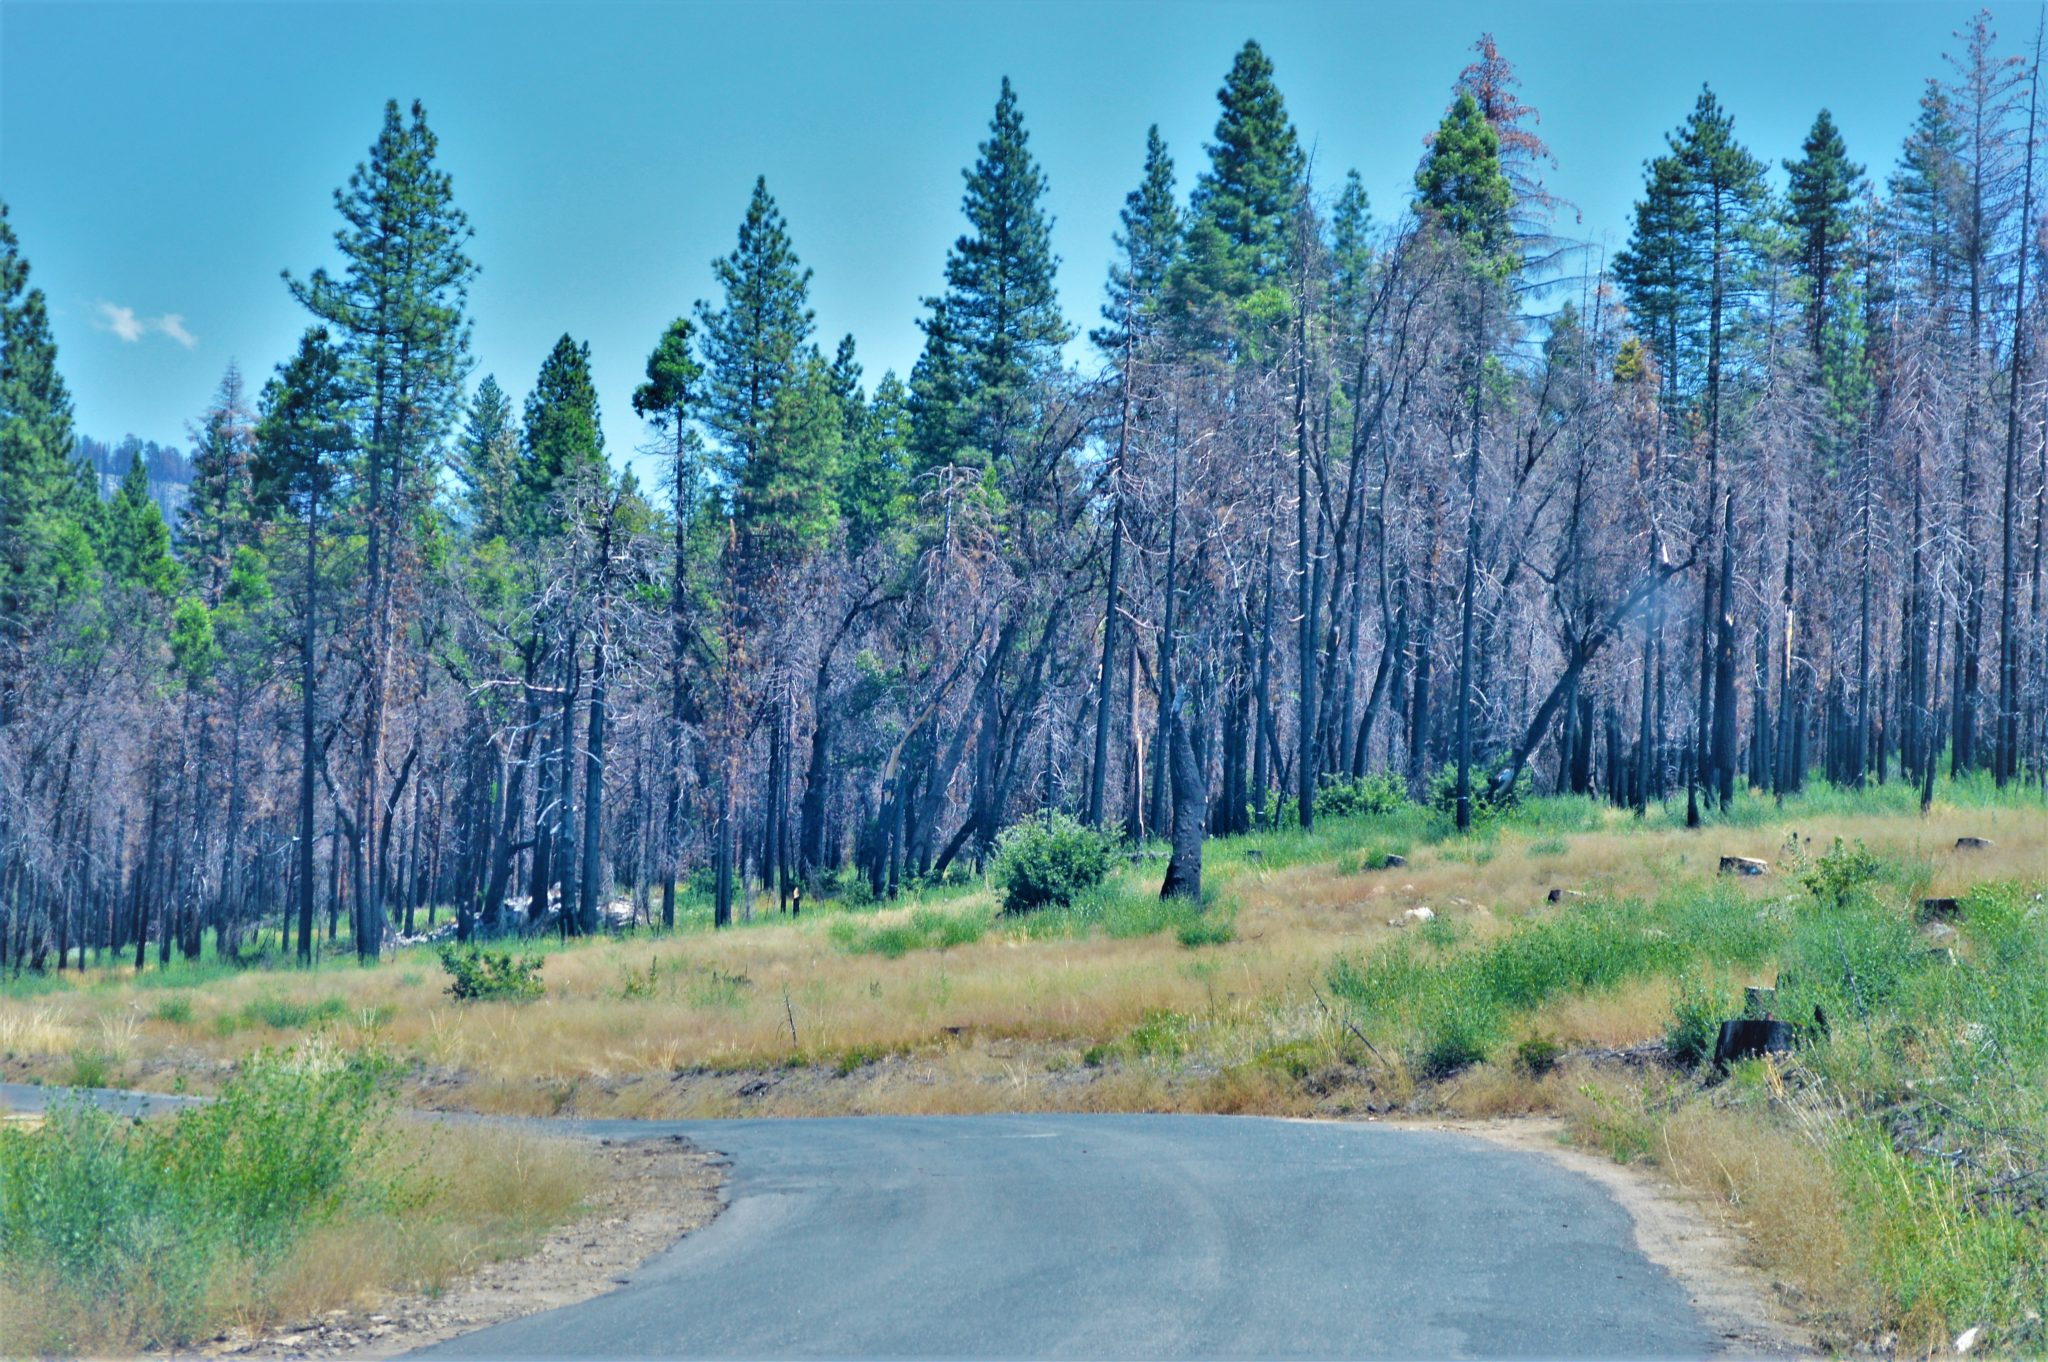 Burnt wild fire trees, Yosemite National Park, California